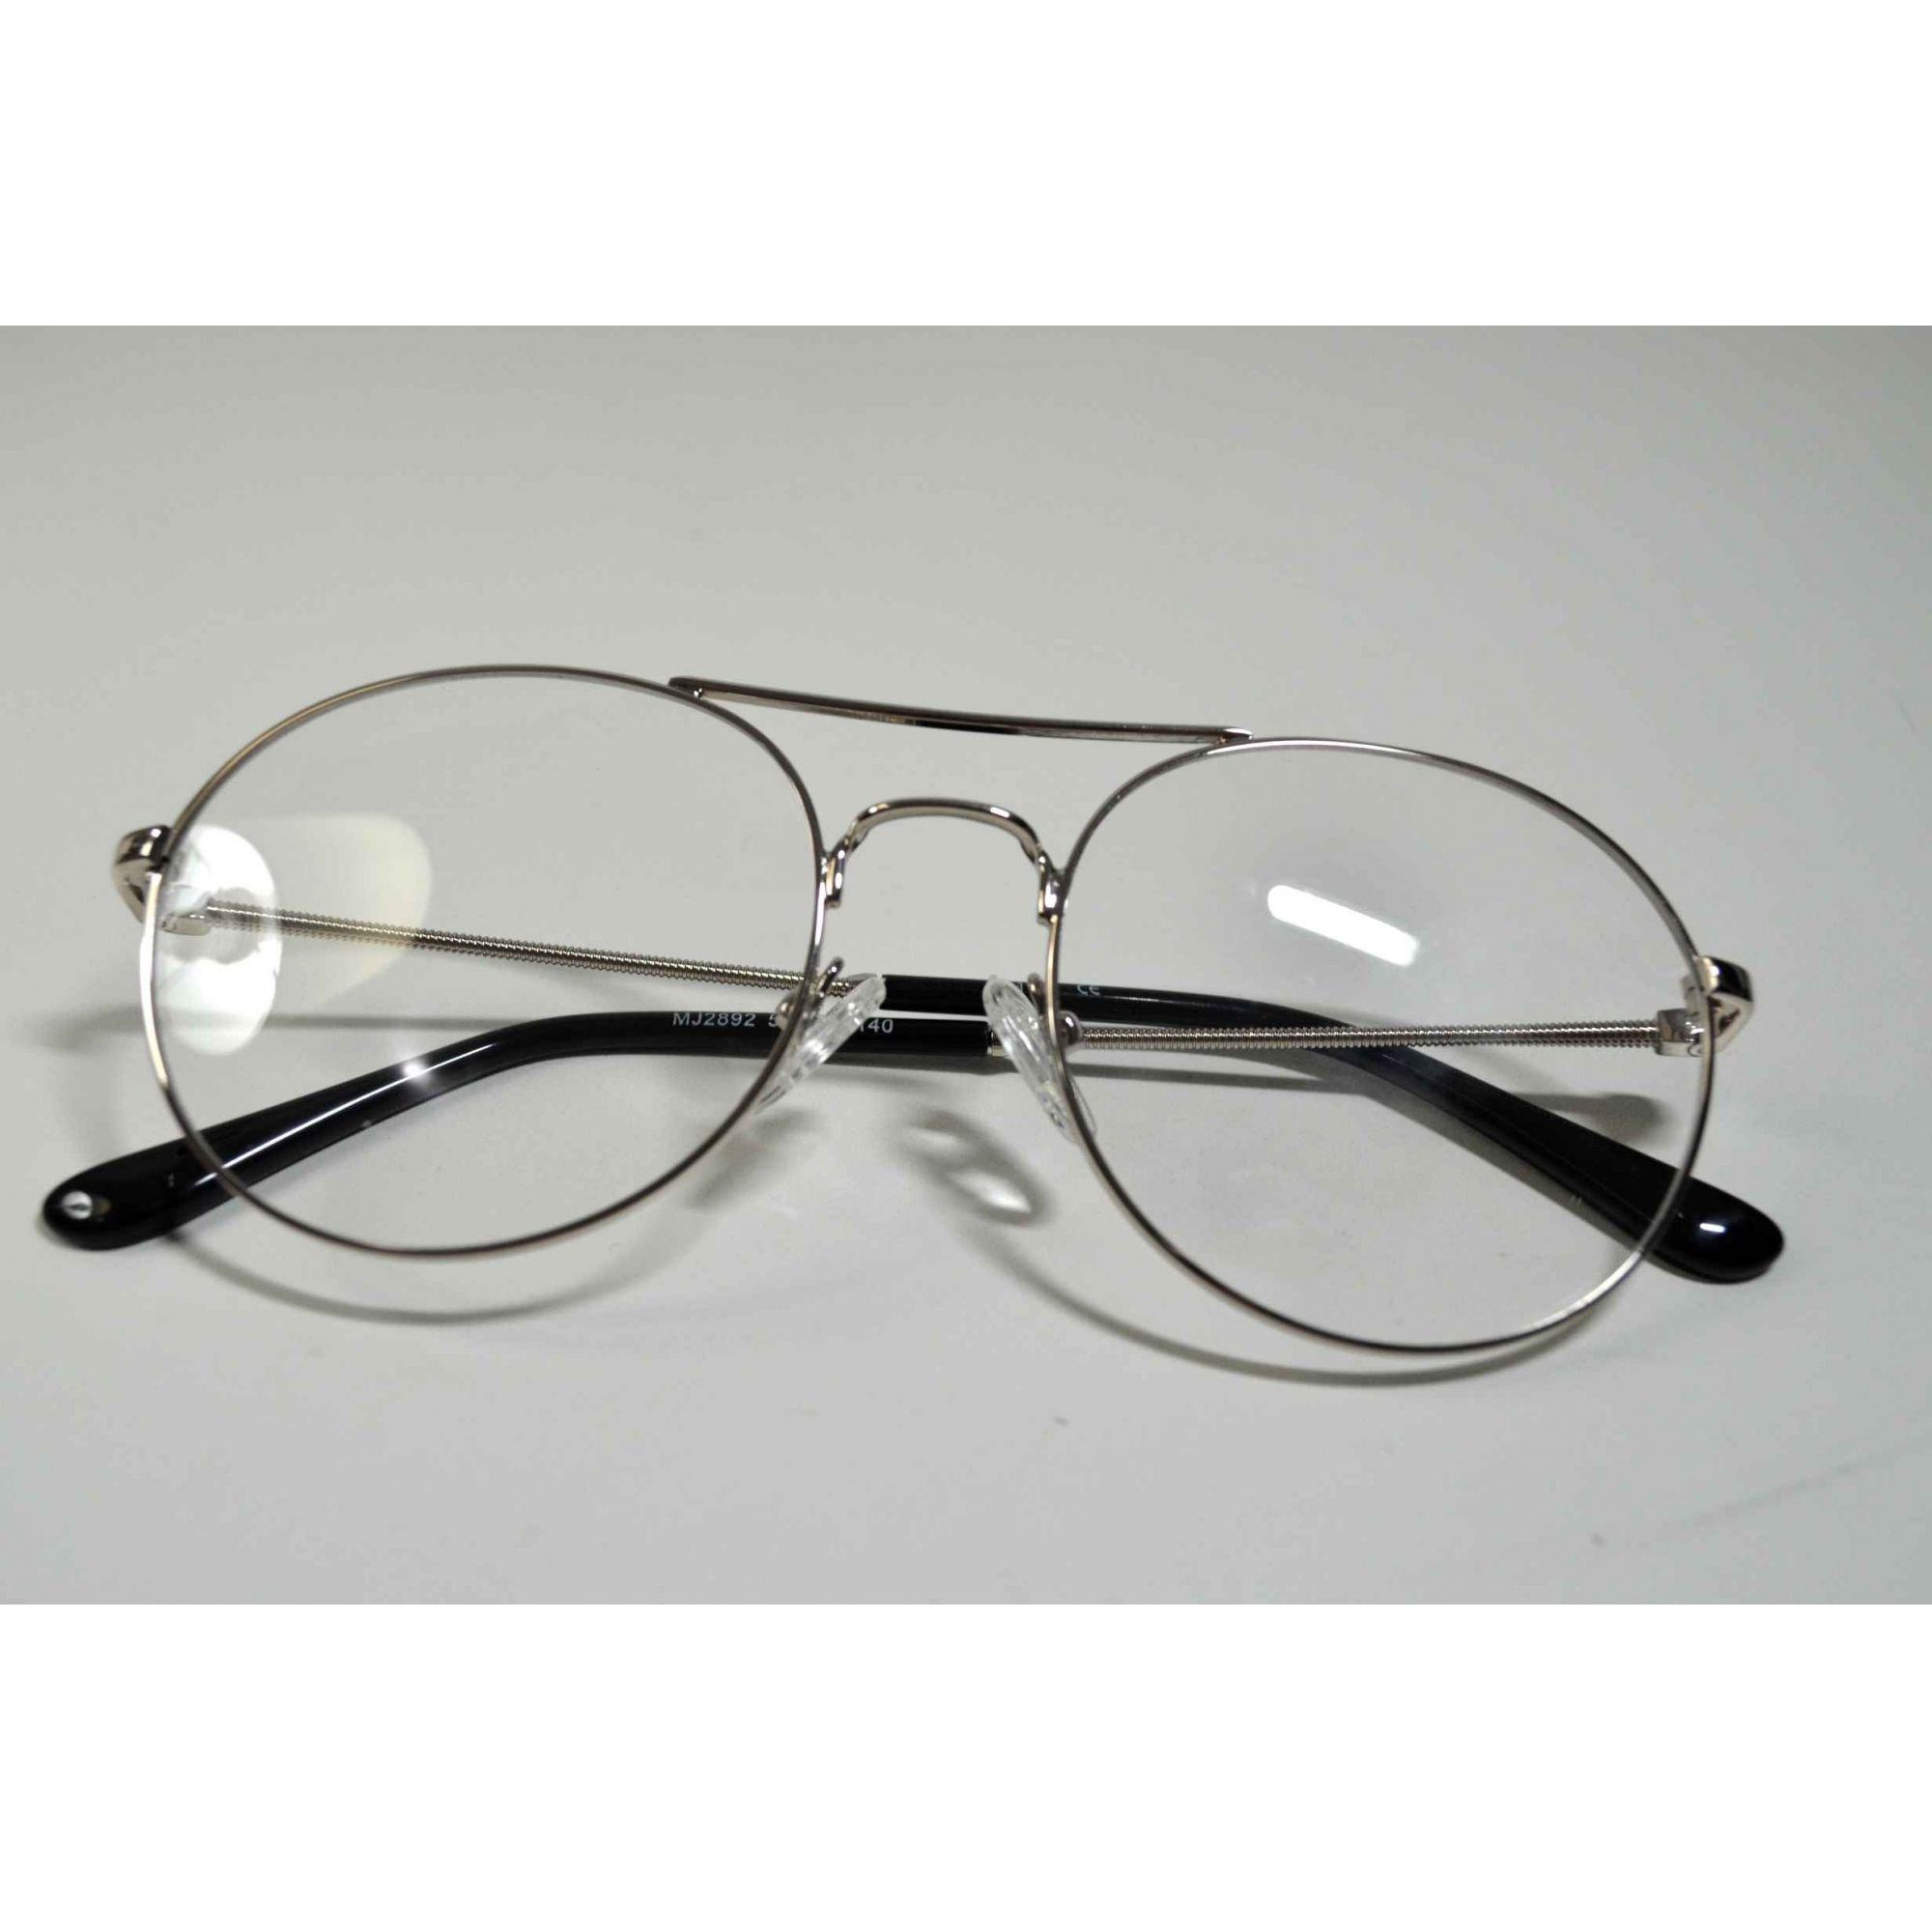 1cf4c91fd7414 ... Armação Óculos Grau Feminino Redondo Vintage Wiikglass 2018 ...